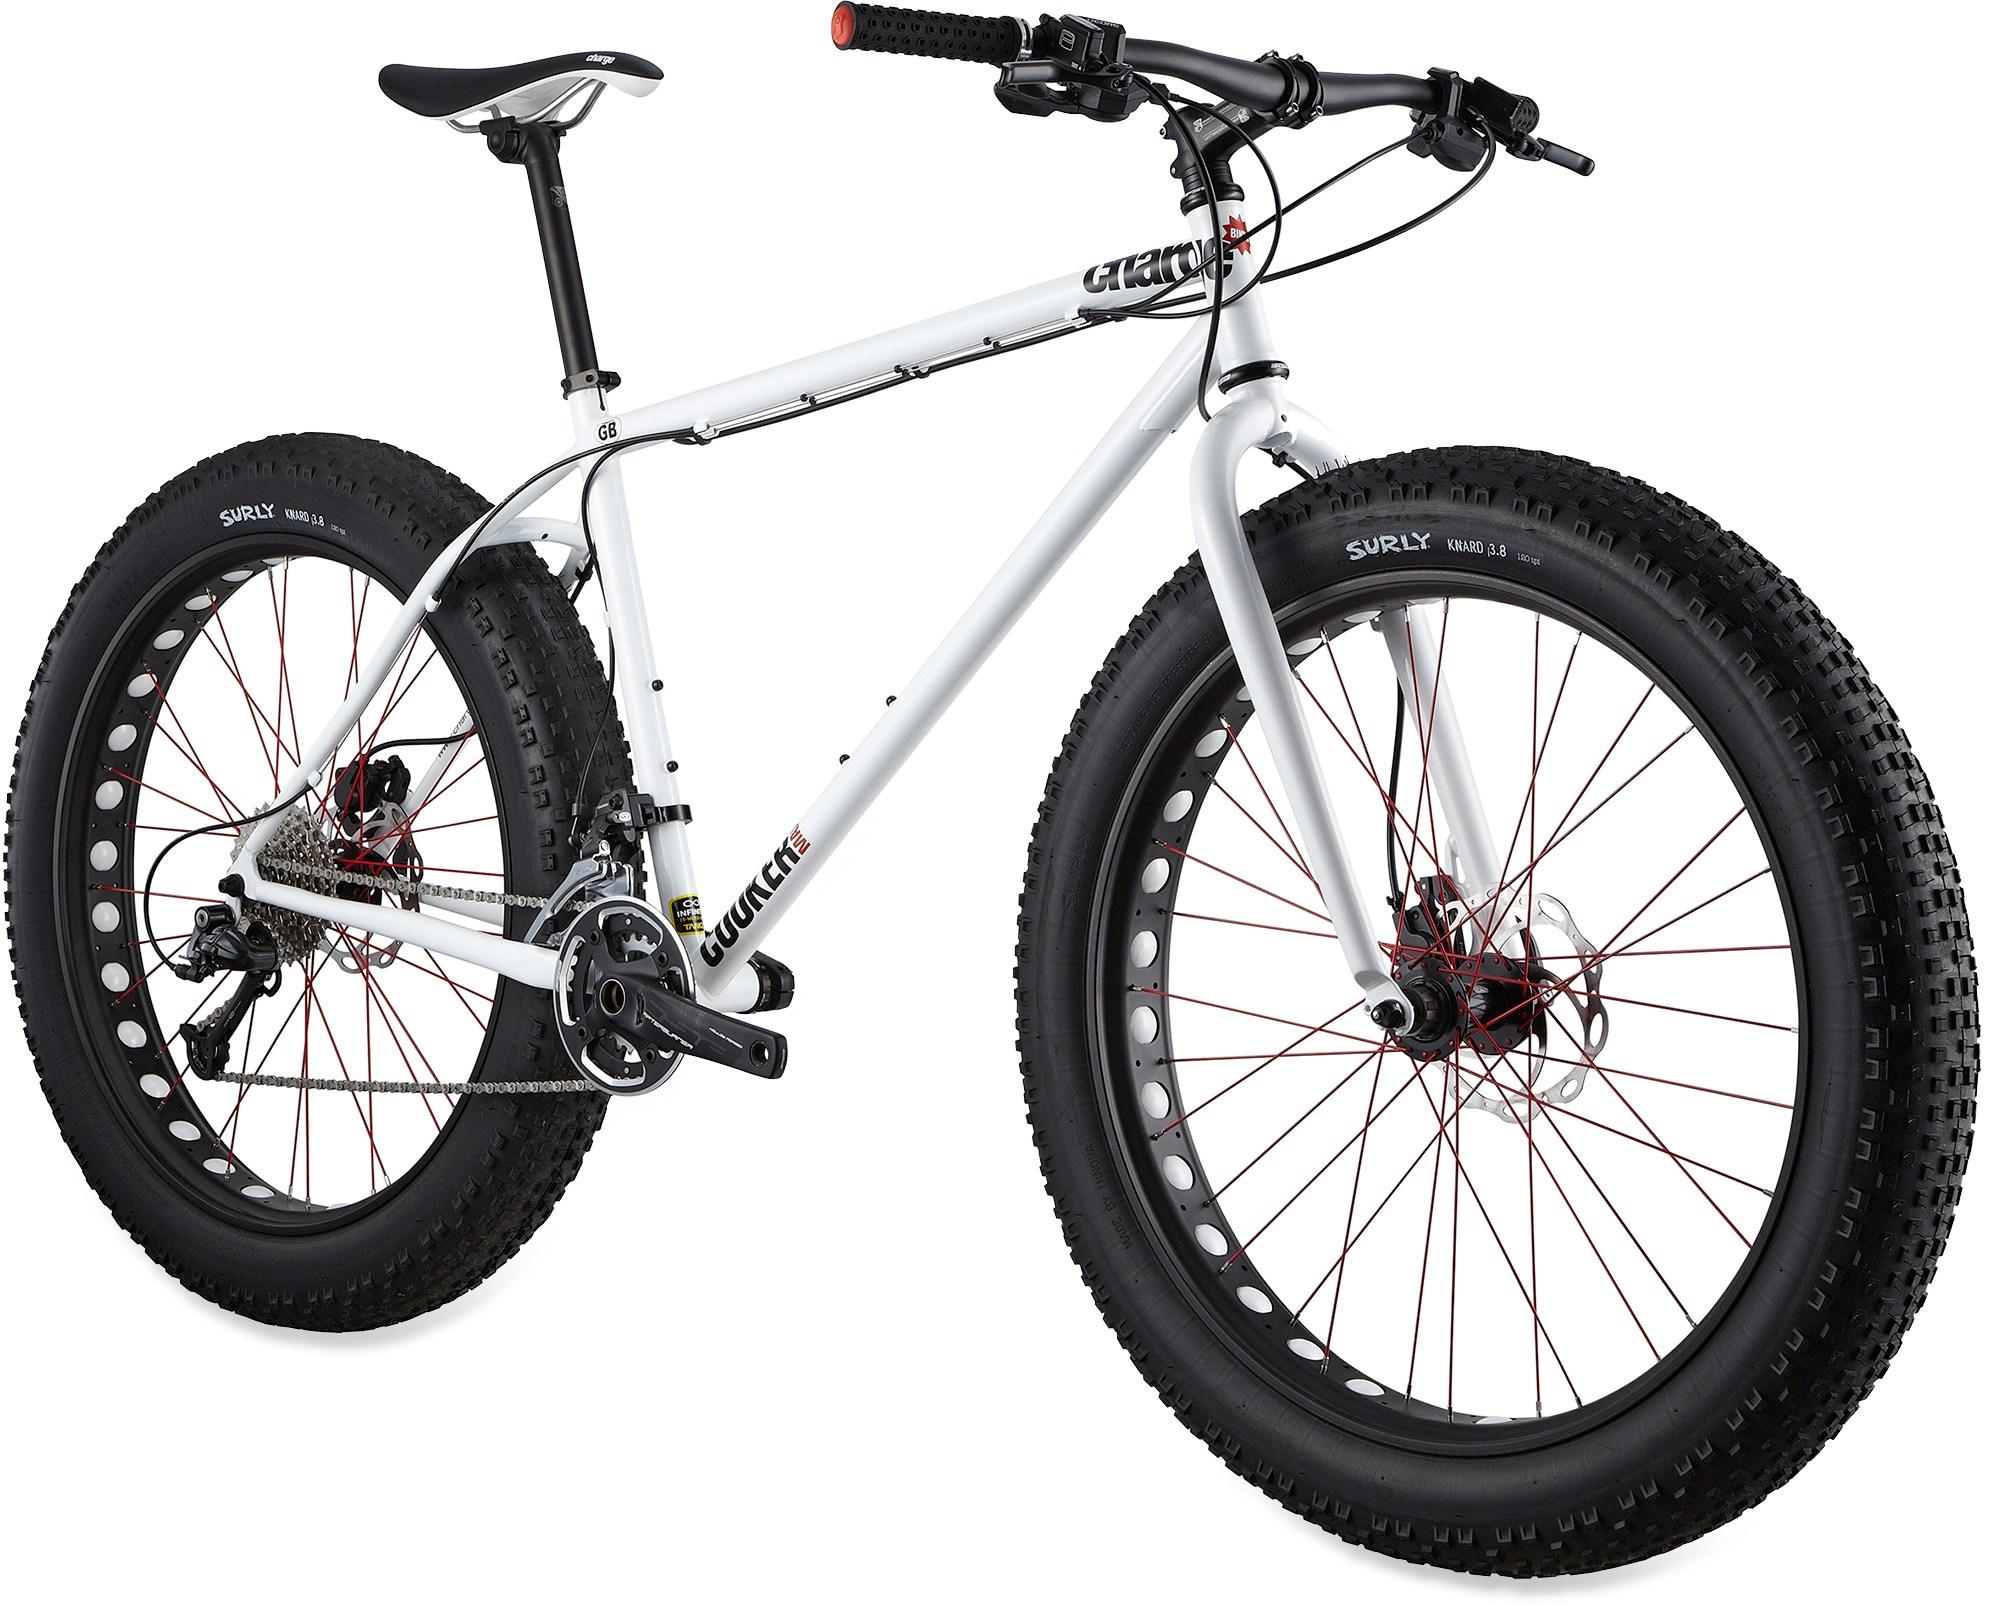 FatBike Charge Bike รุ่น Cooker Maxi 2